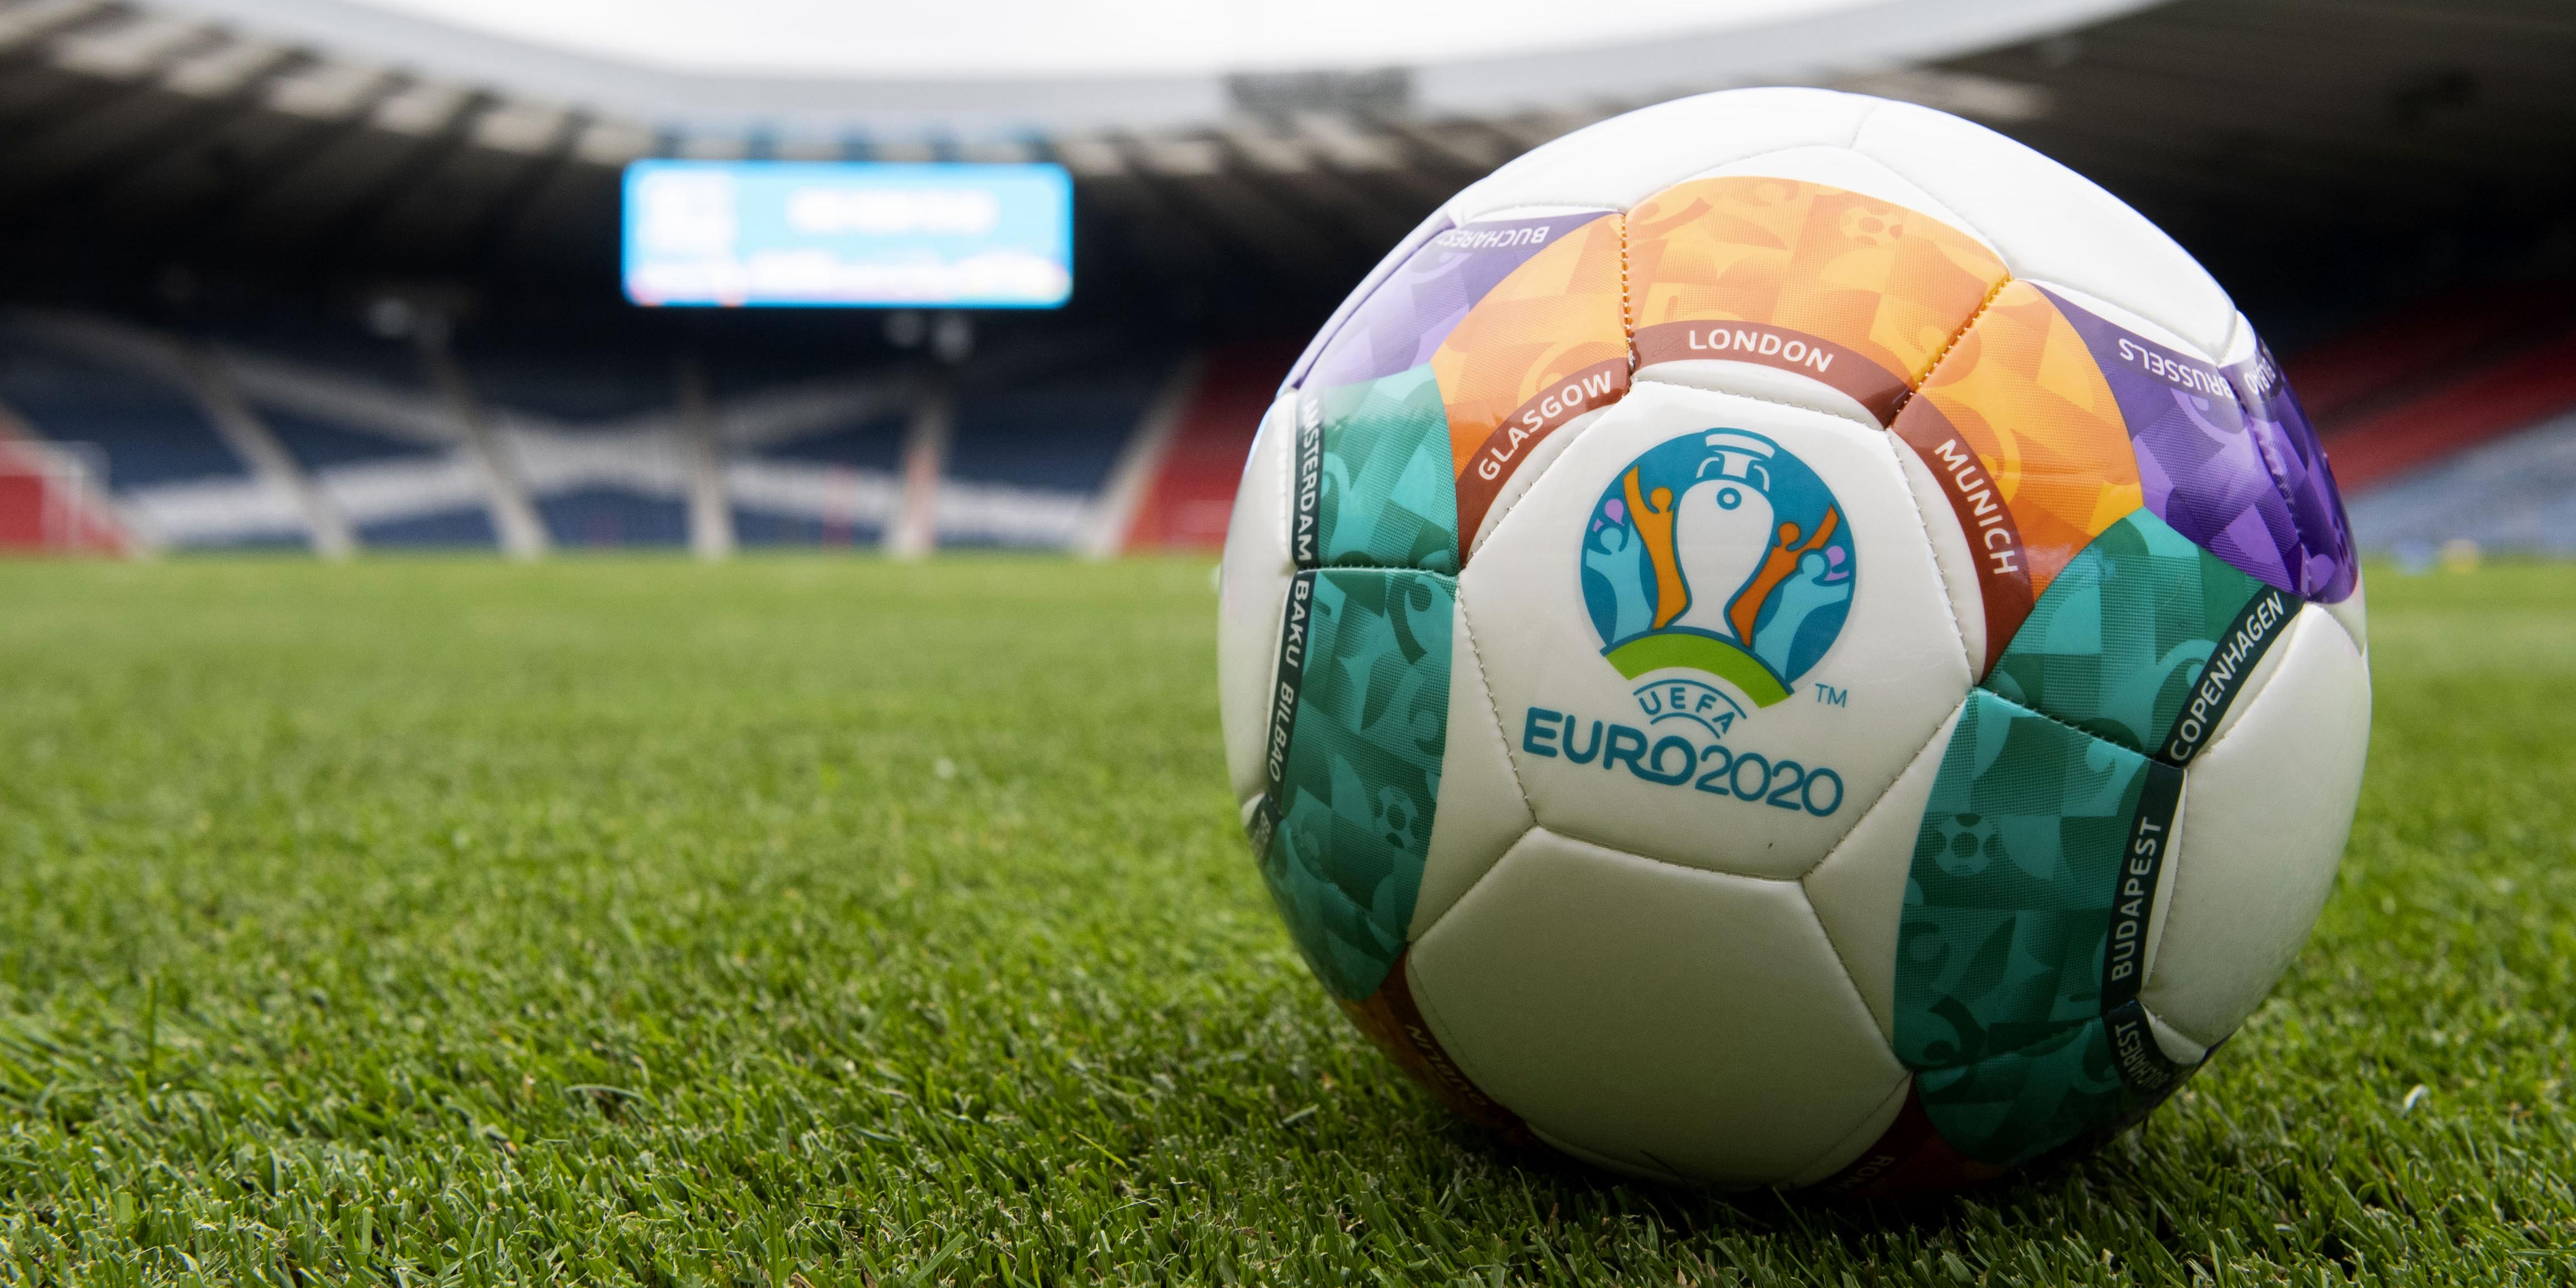 Peluang-Terbaik-Judi-Bola-Piala-Eropa-2020